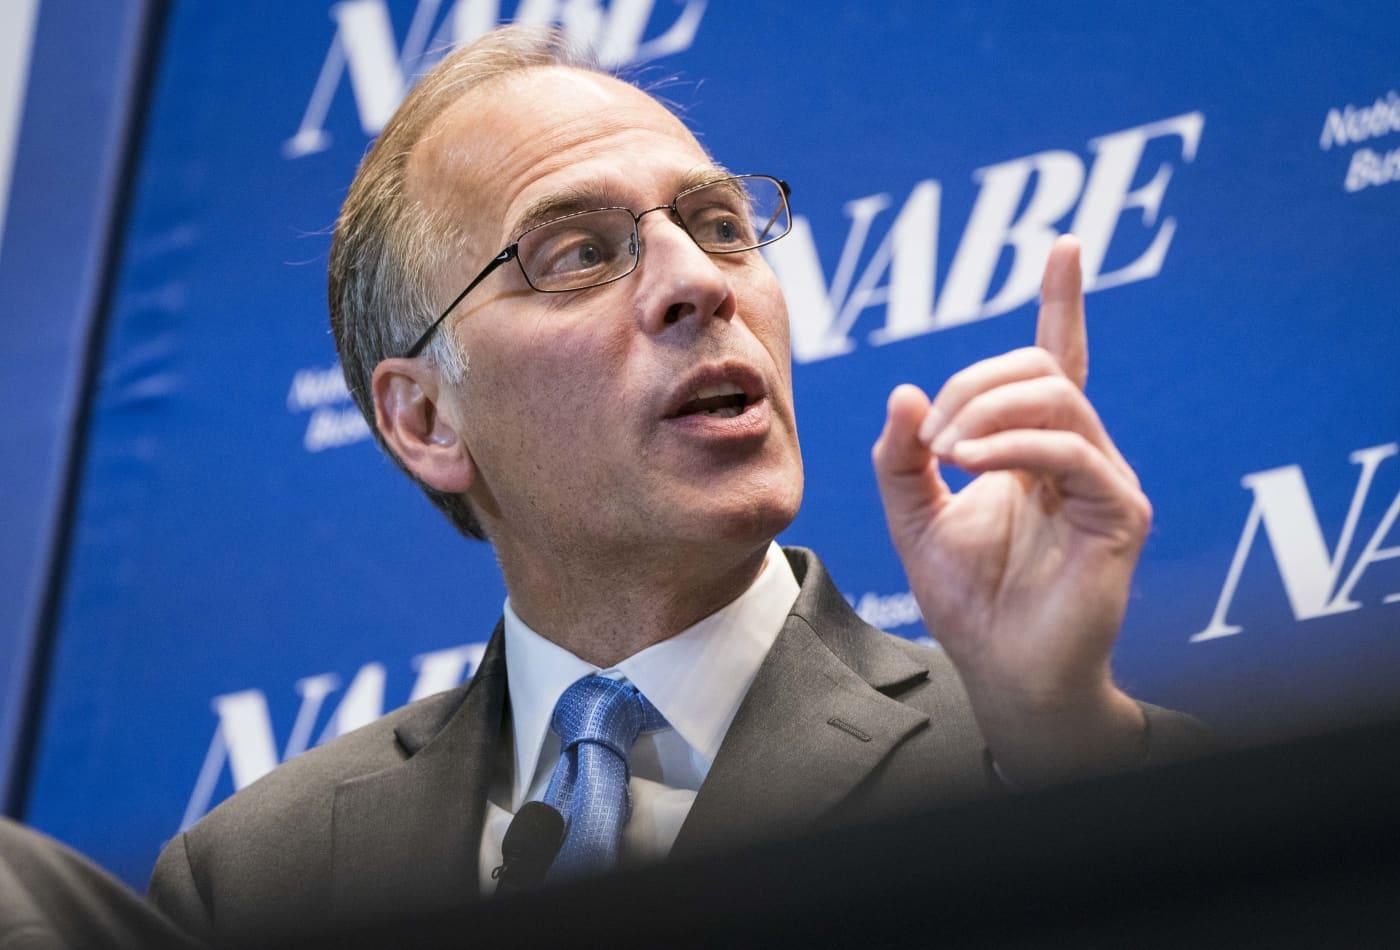 Investors haven't fully grasped inflation is 'dead ahead,' economist Mark Zandi warns